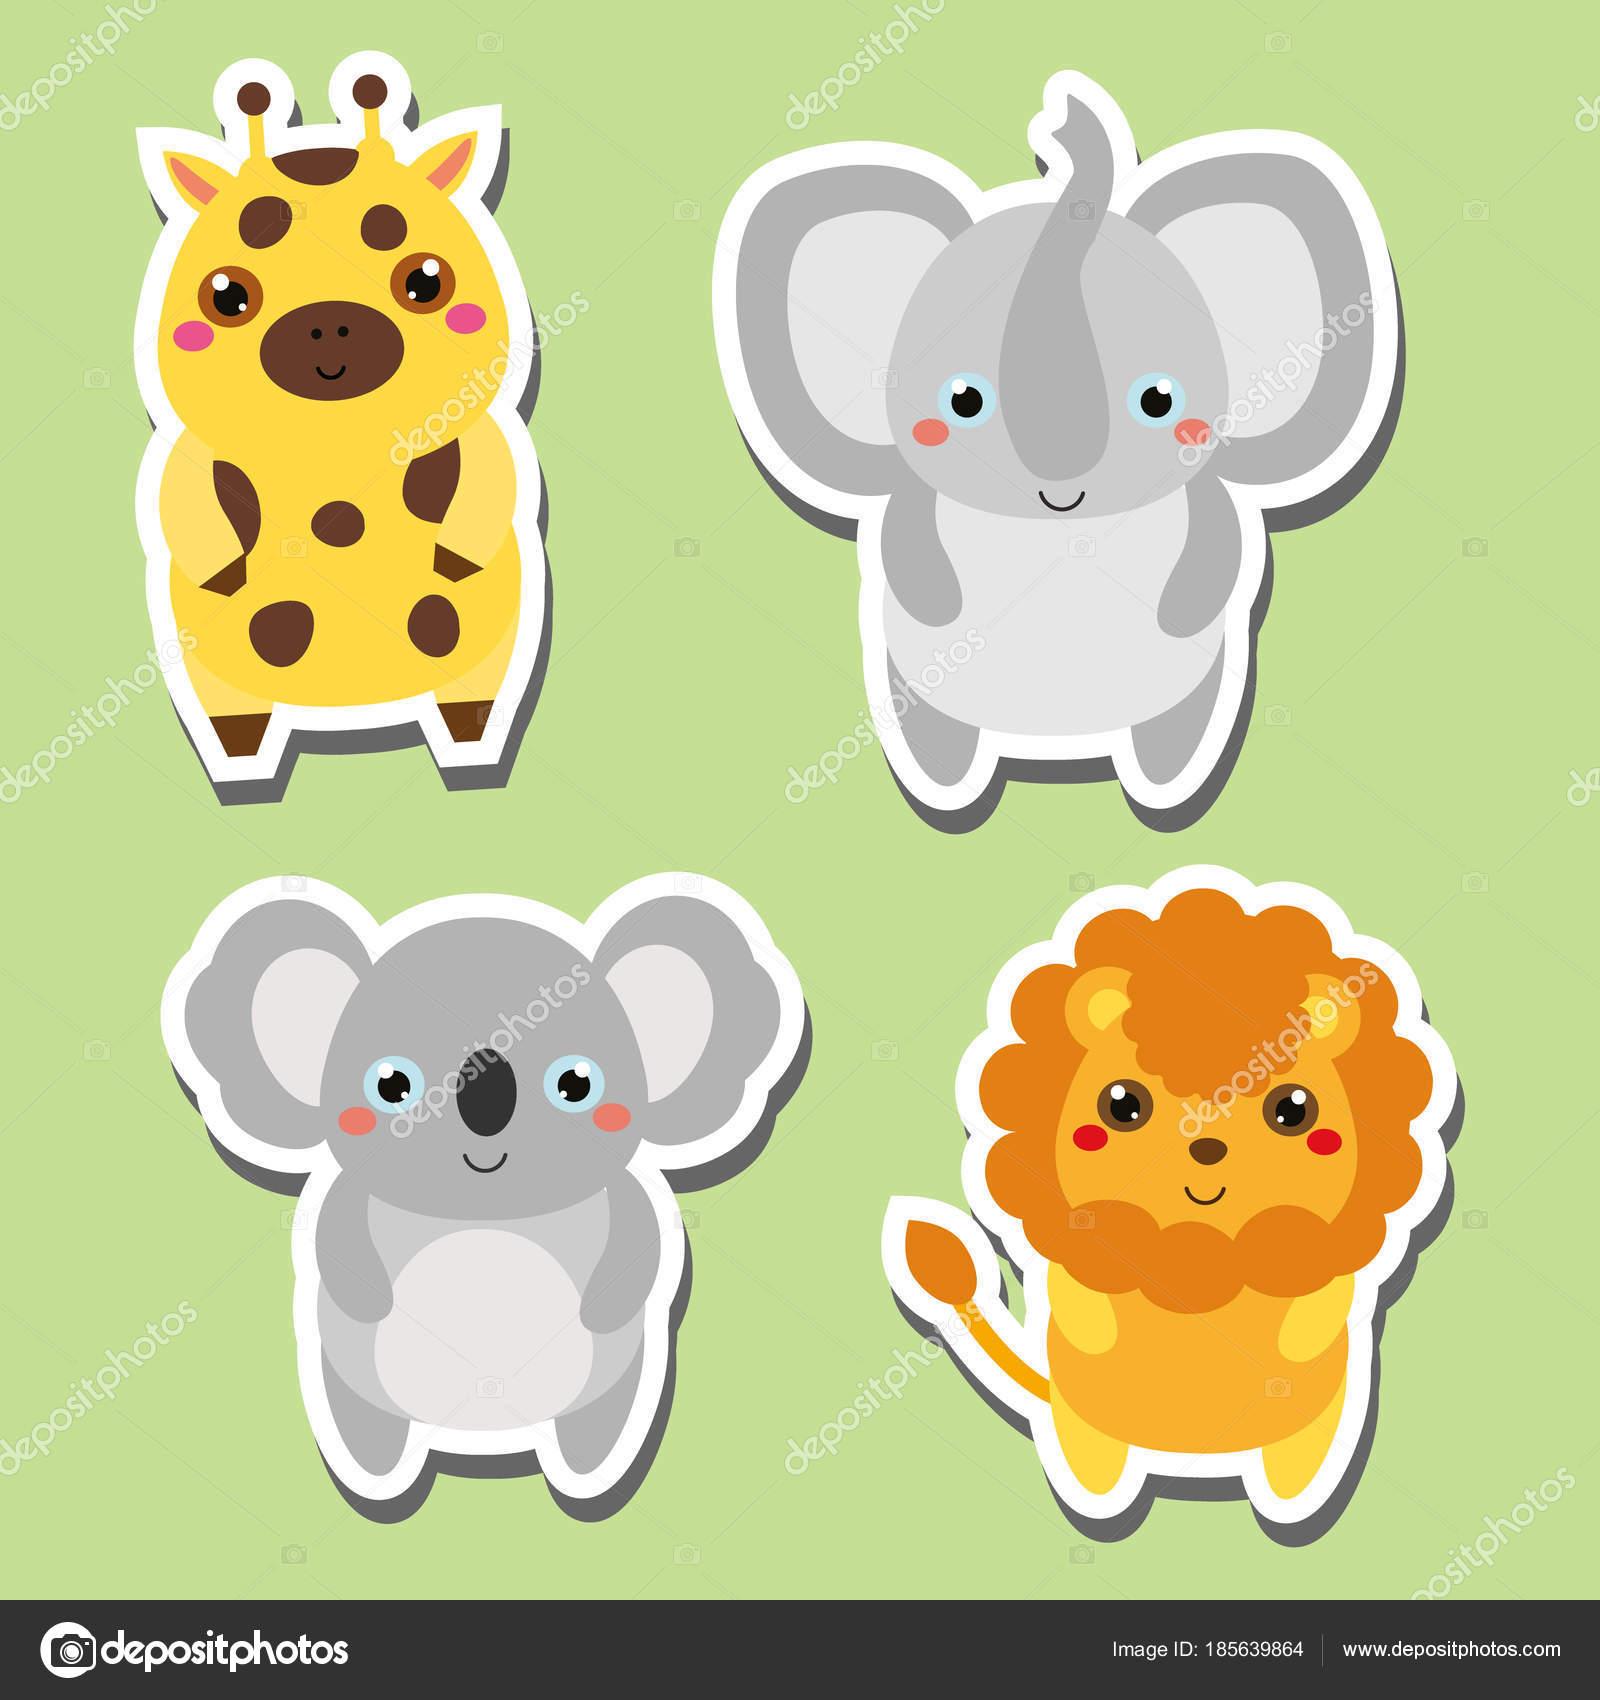 Cute Kawaii Tiere Aufkleber Set Vektor Illustration Koala Giraffe Elefant Lowe